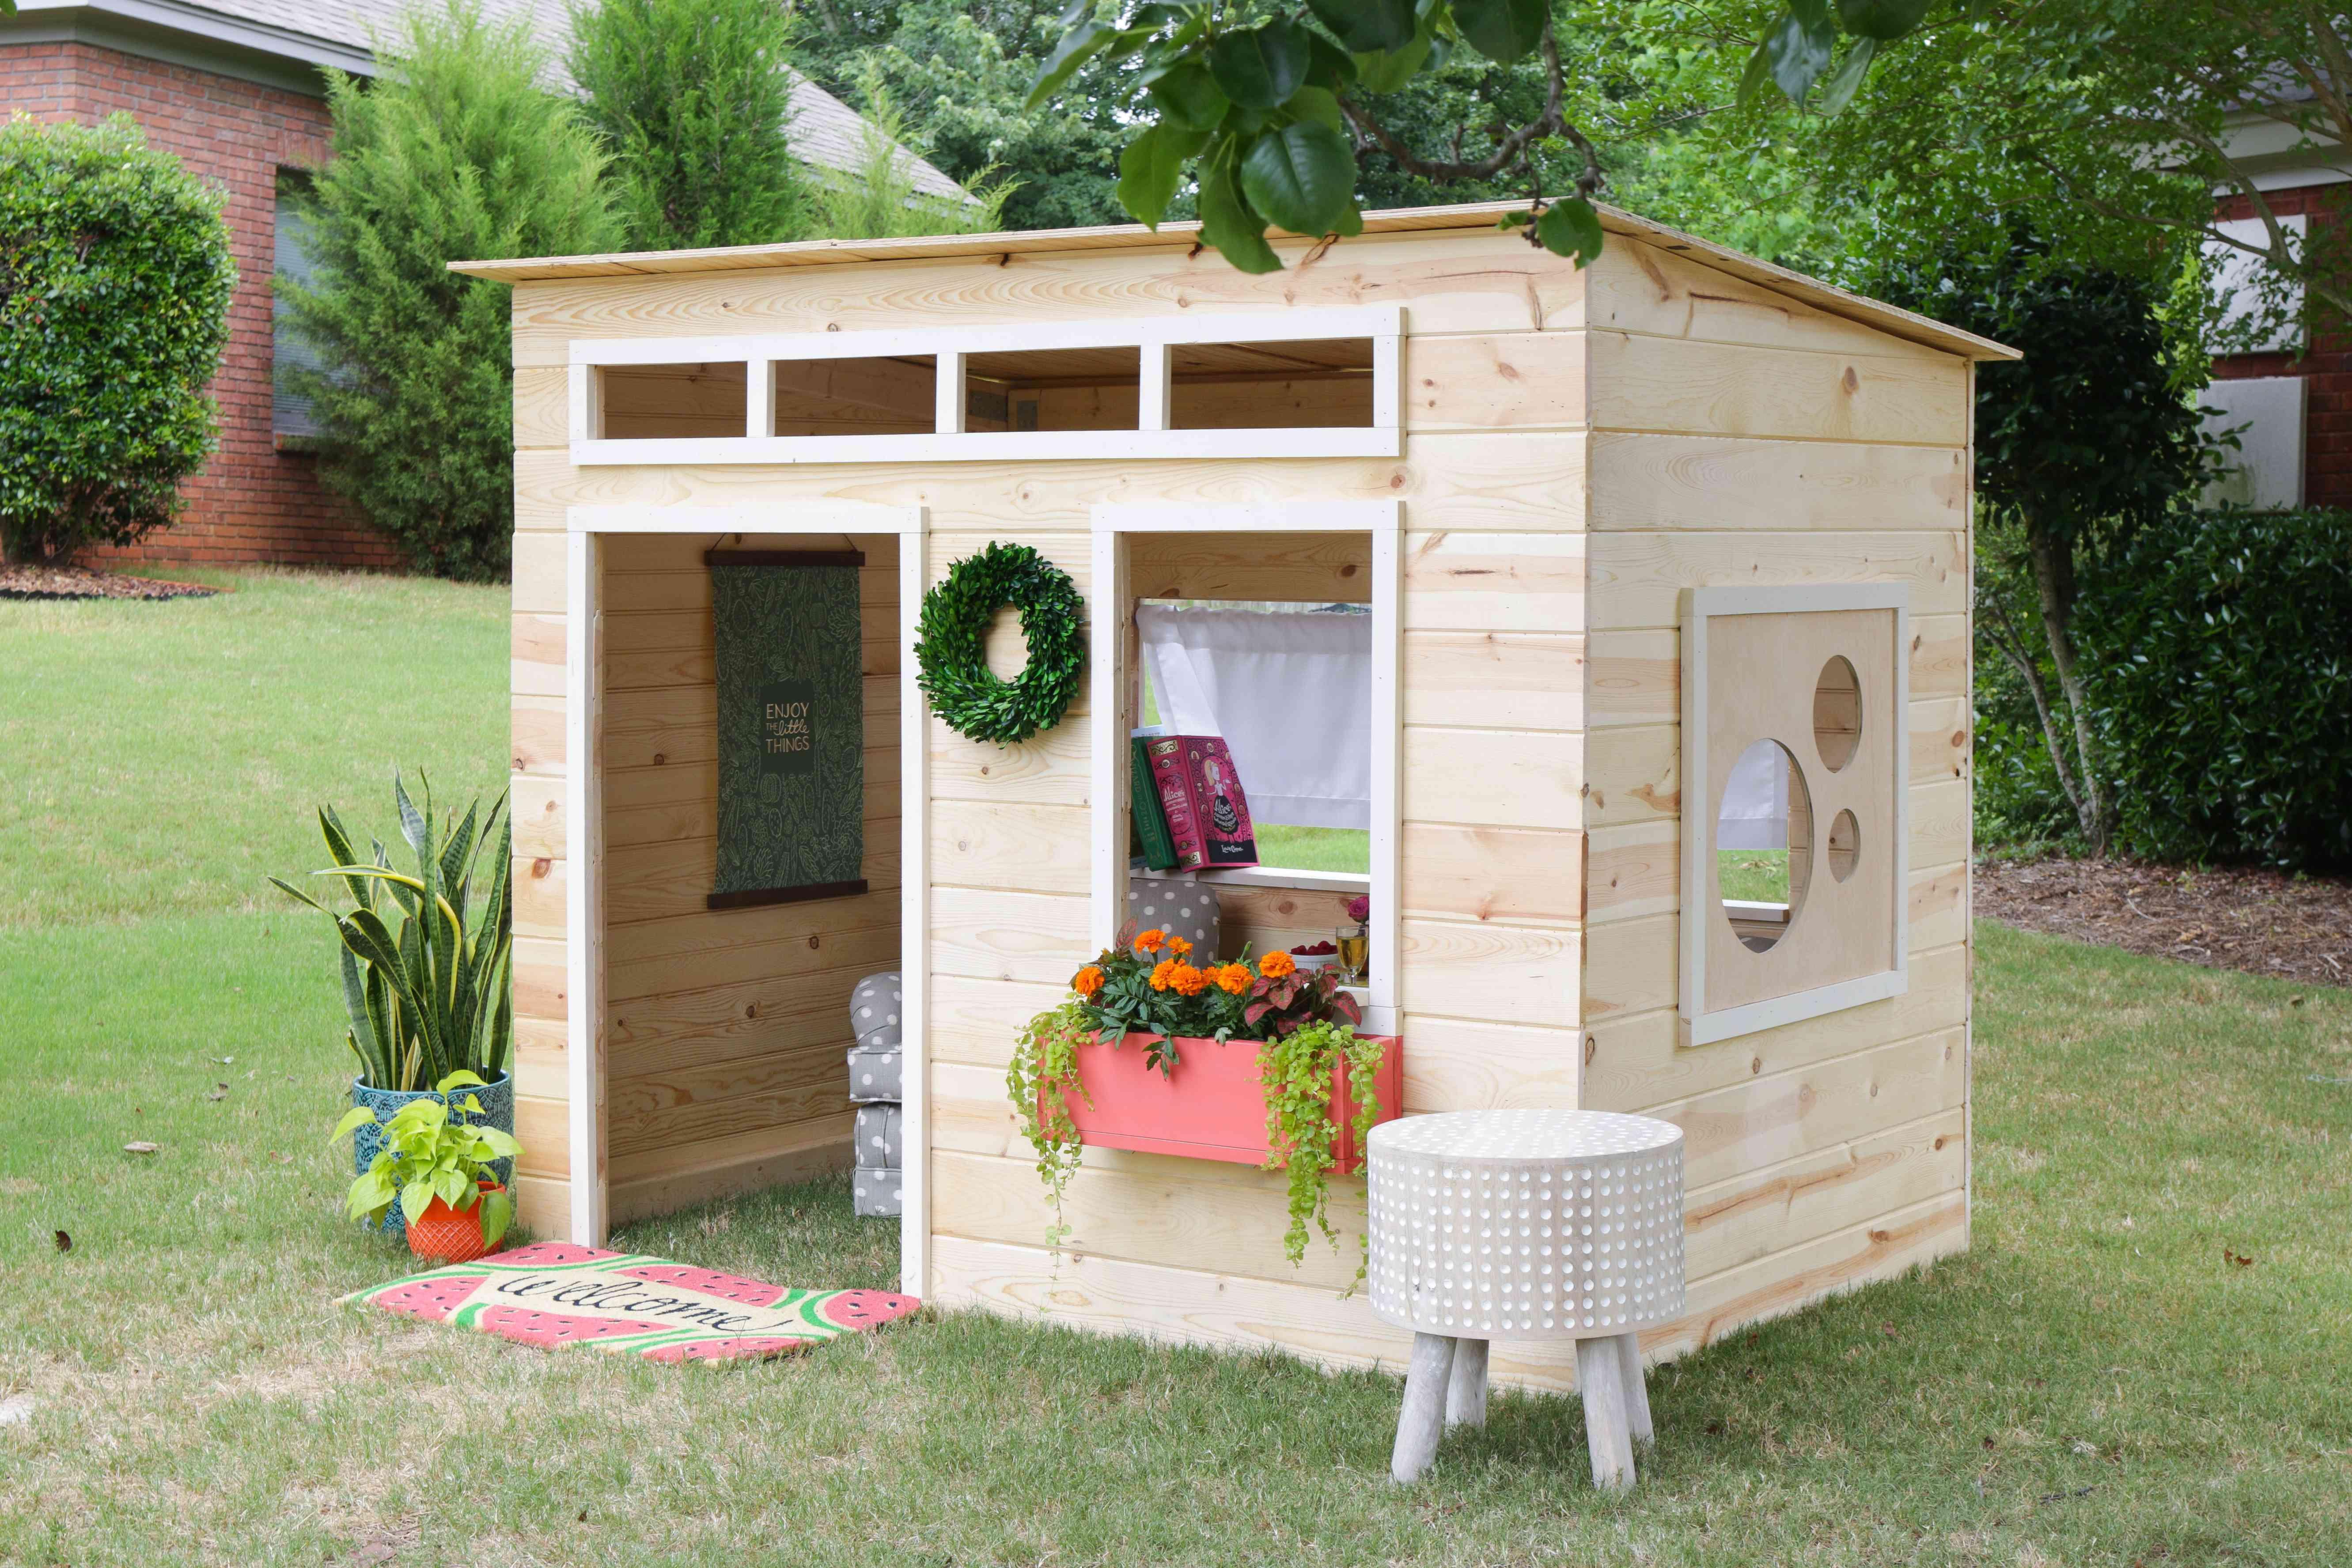 Jen Woodhouse's custom backyard playhouse